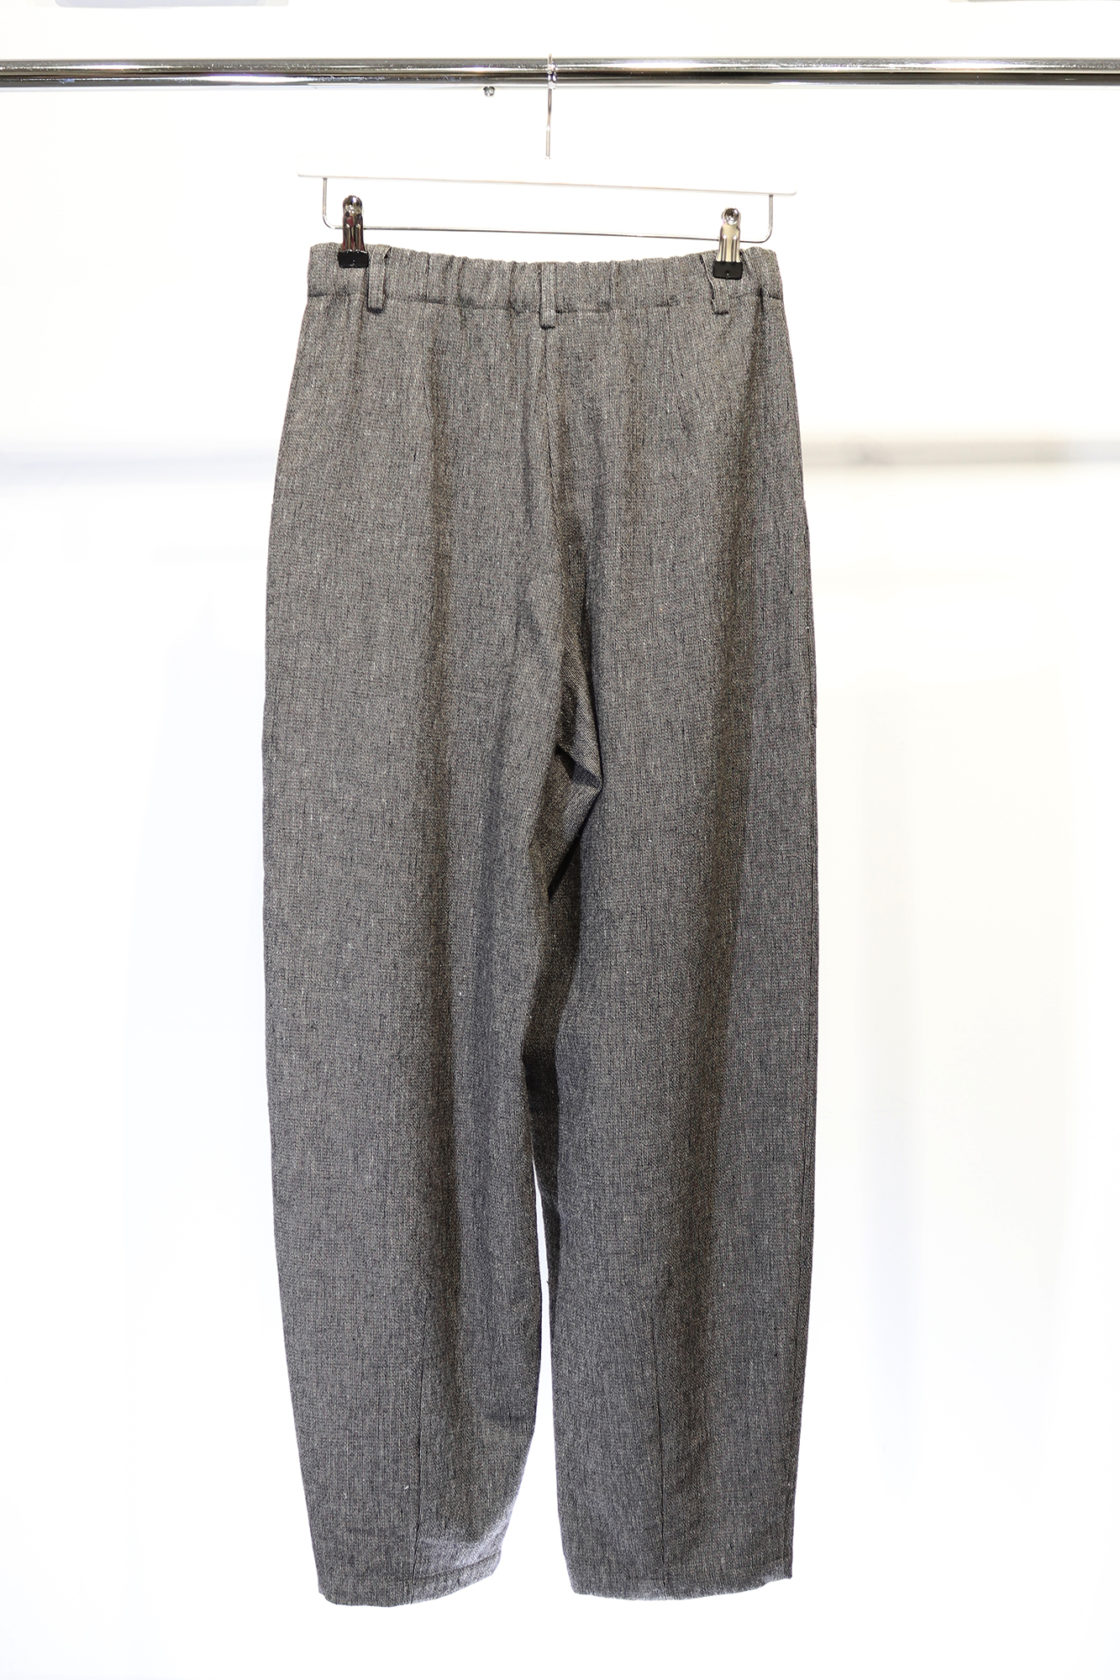 Roberta Organic Fashion Naturalmente Hose Loose Fit Grau 1